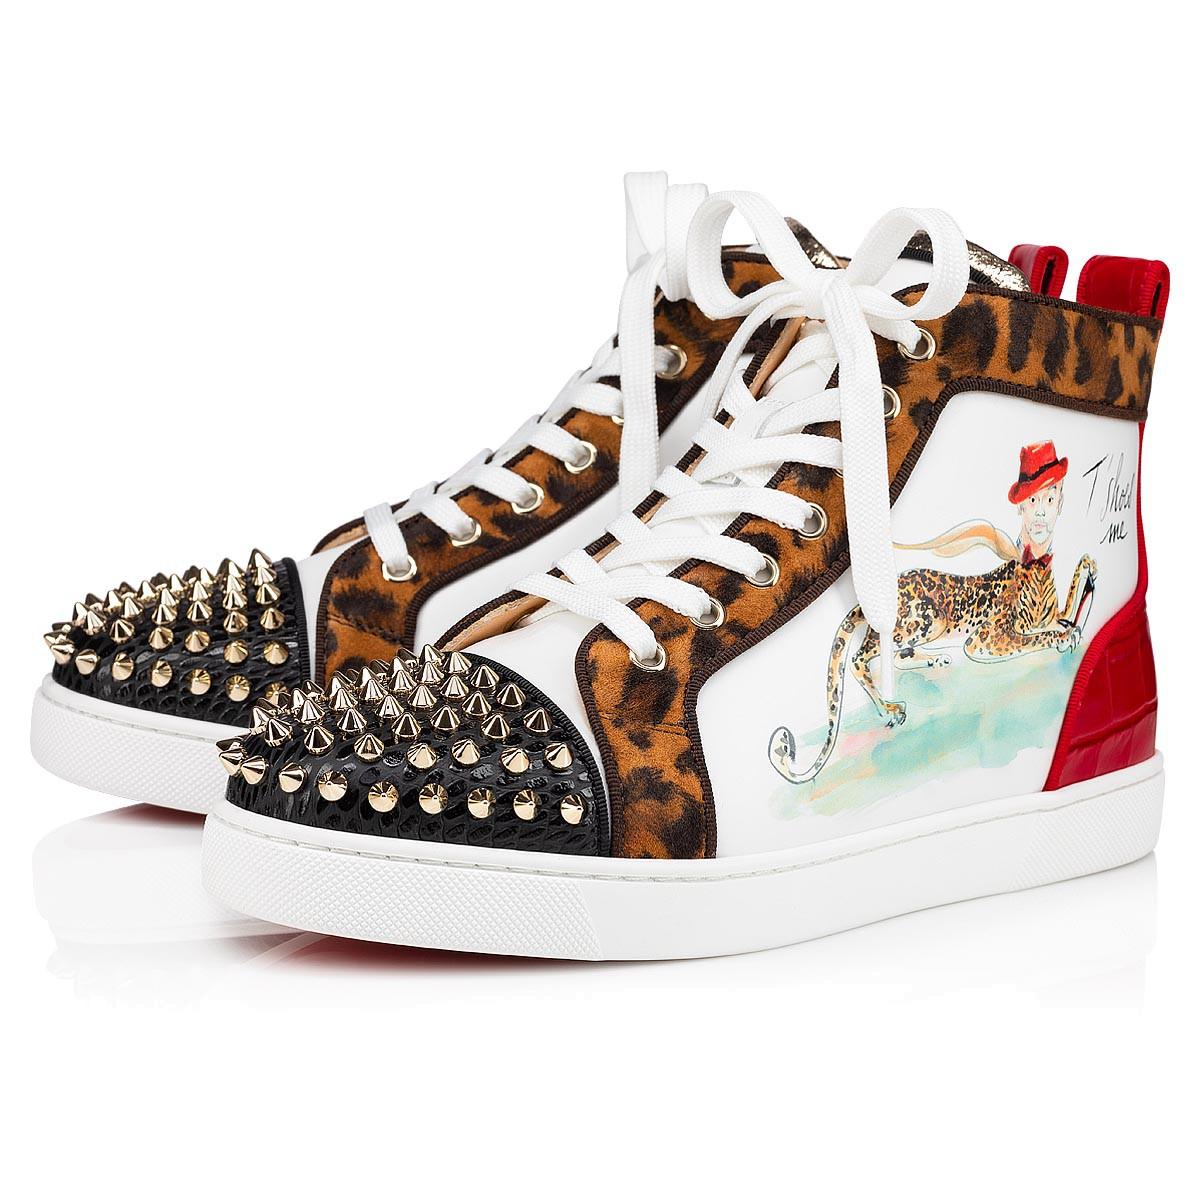 Shoes - Lou Spikes Paris Loubi Woman - Christian Louboutin